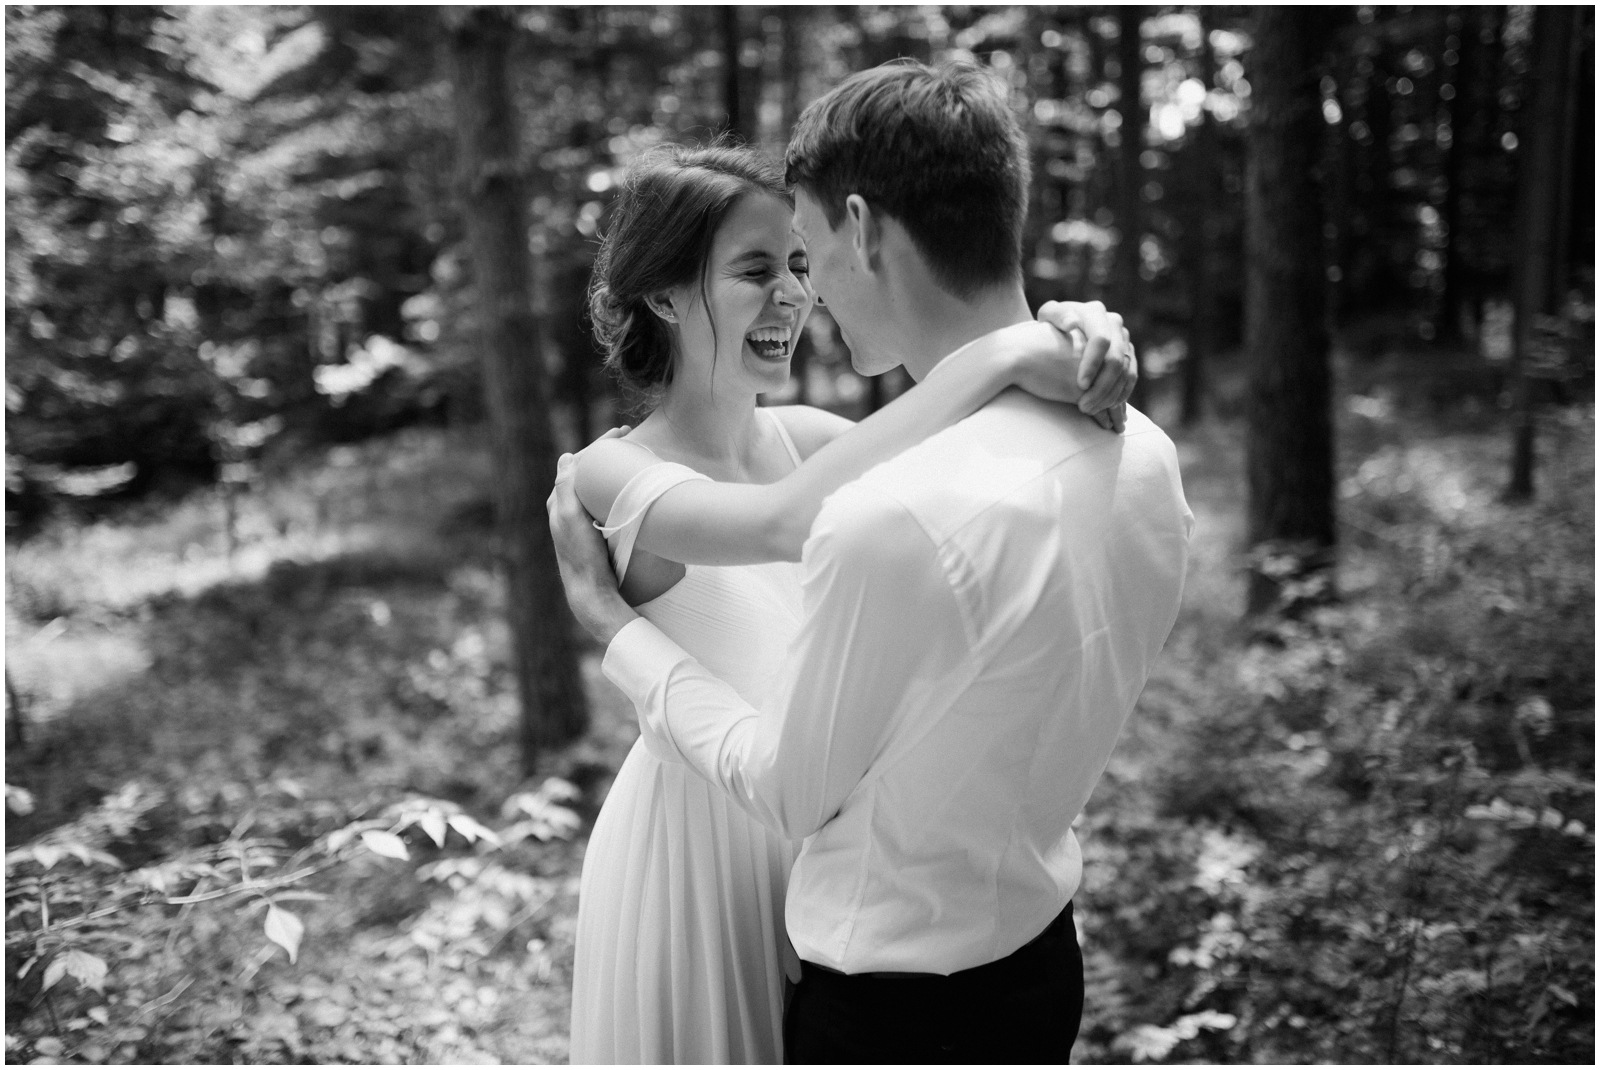 mirjam_thomas_wedding-256-2.jpg